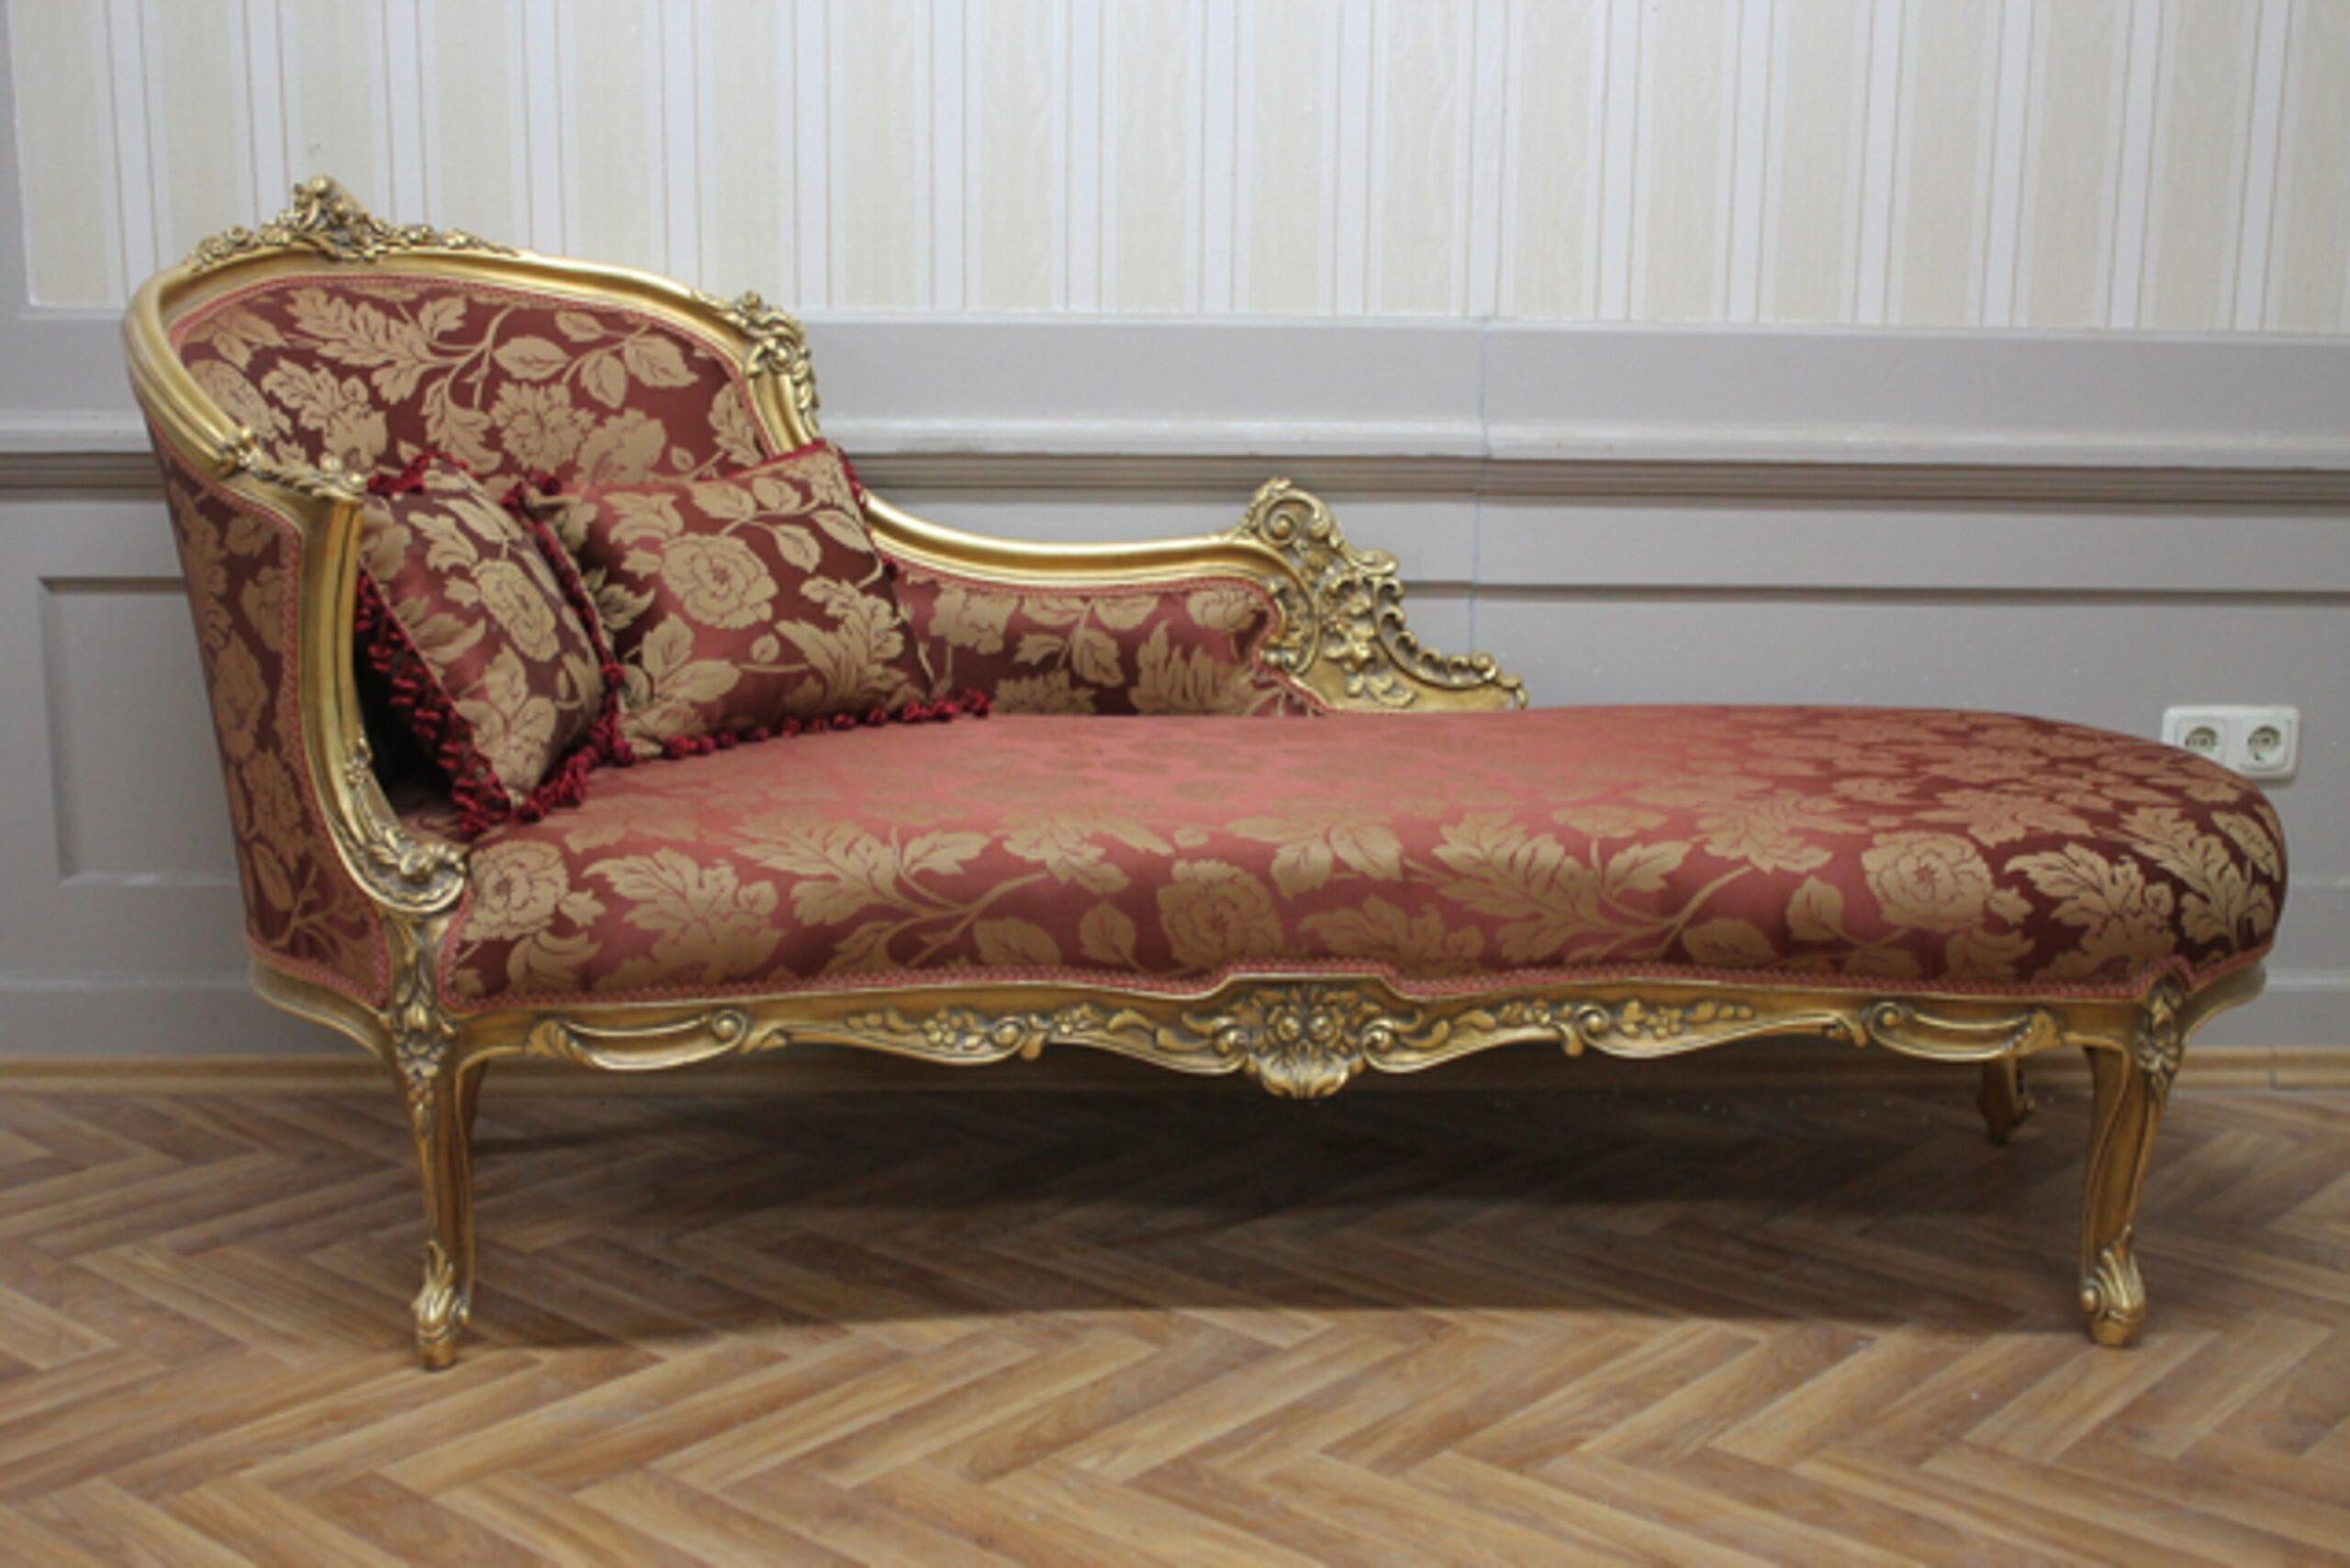 Full Size of Antik Couch Gebraucht Kaufen Sofa Antiklederoptik Braun Sofas Leder Optik Murah Stil Ledersofa Big Chesterfield Schweiz Look Malaysia Luxus Polsterreiniger Sofa Sofa Antik